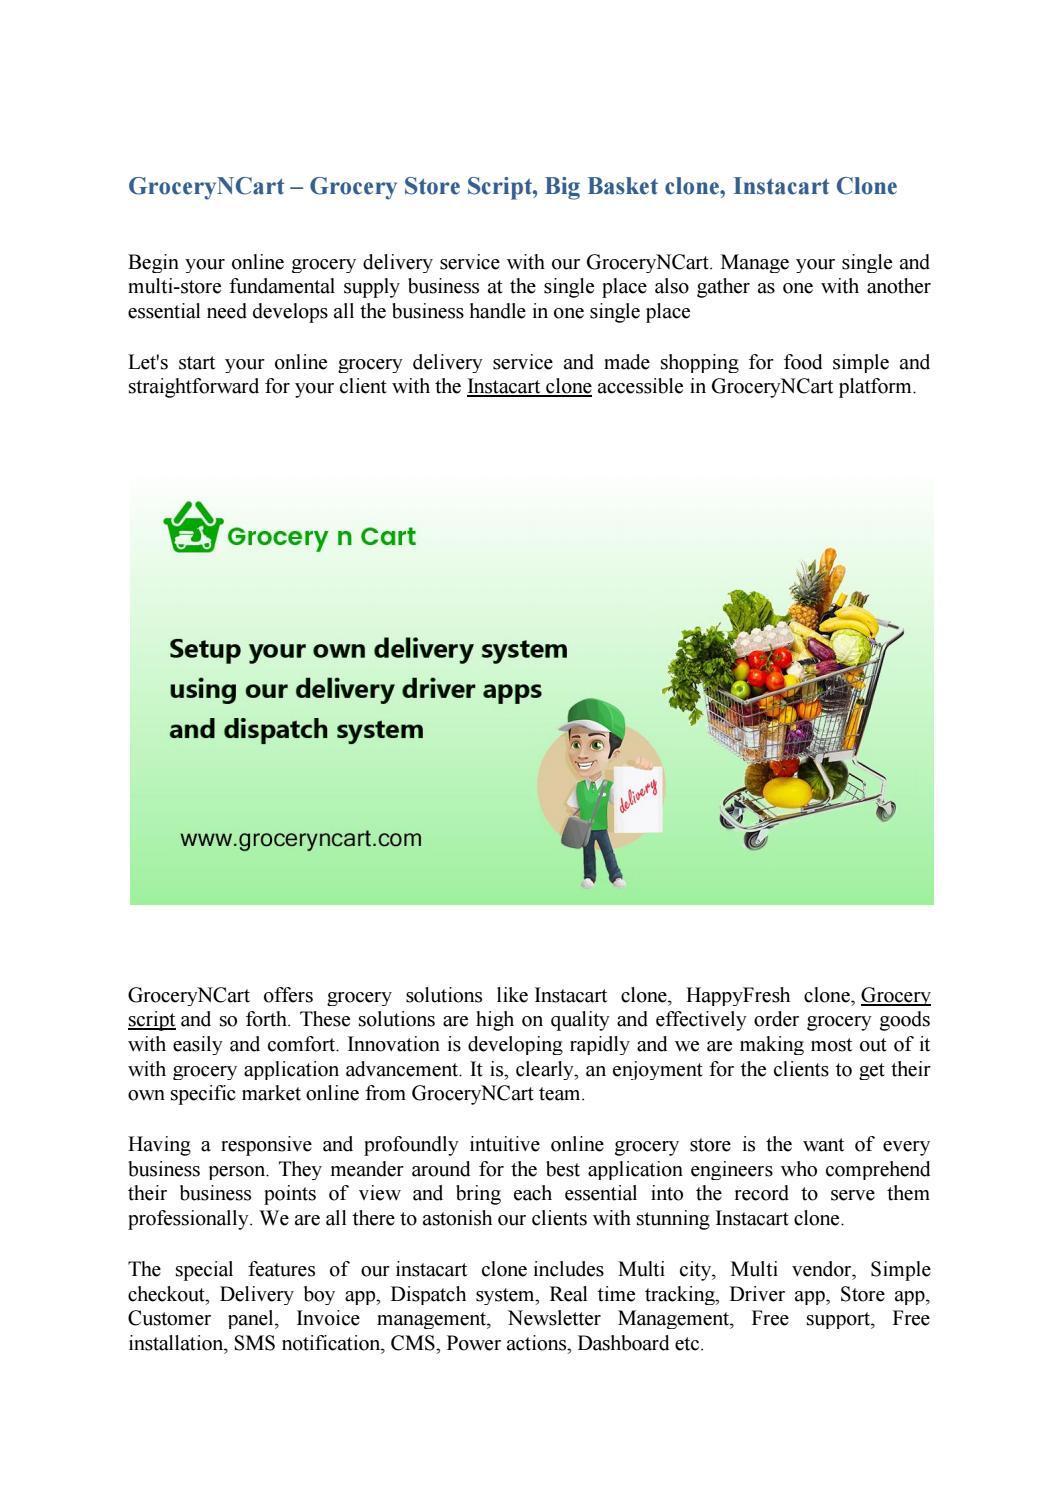 Groceryncart - Supermarket Software, Instacart Clone